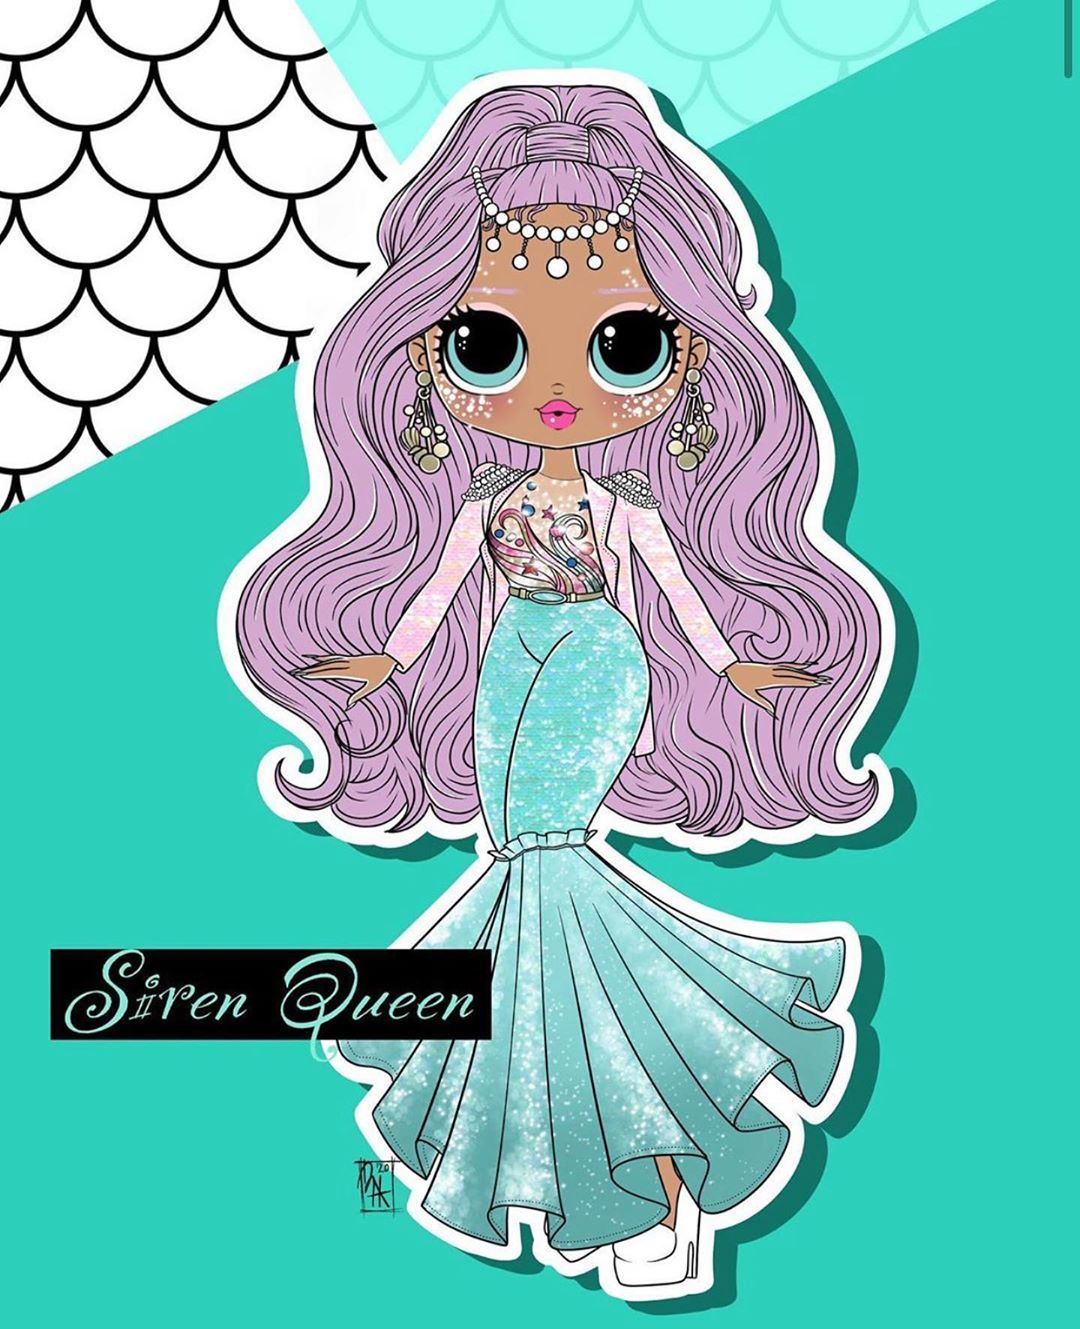 956 Otmetok Nravitsya 8 Kommentariev Lol Surprise Lol Omg Surprise V Instagram Beautiful Siren Que Lol Dolls Cute Cartoon Wallpapers Girls Cartoon Art